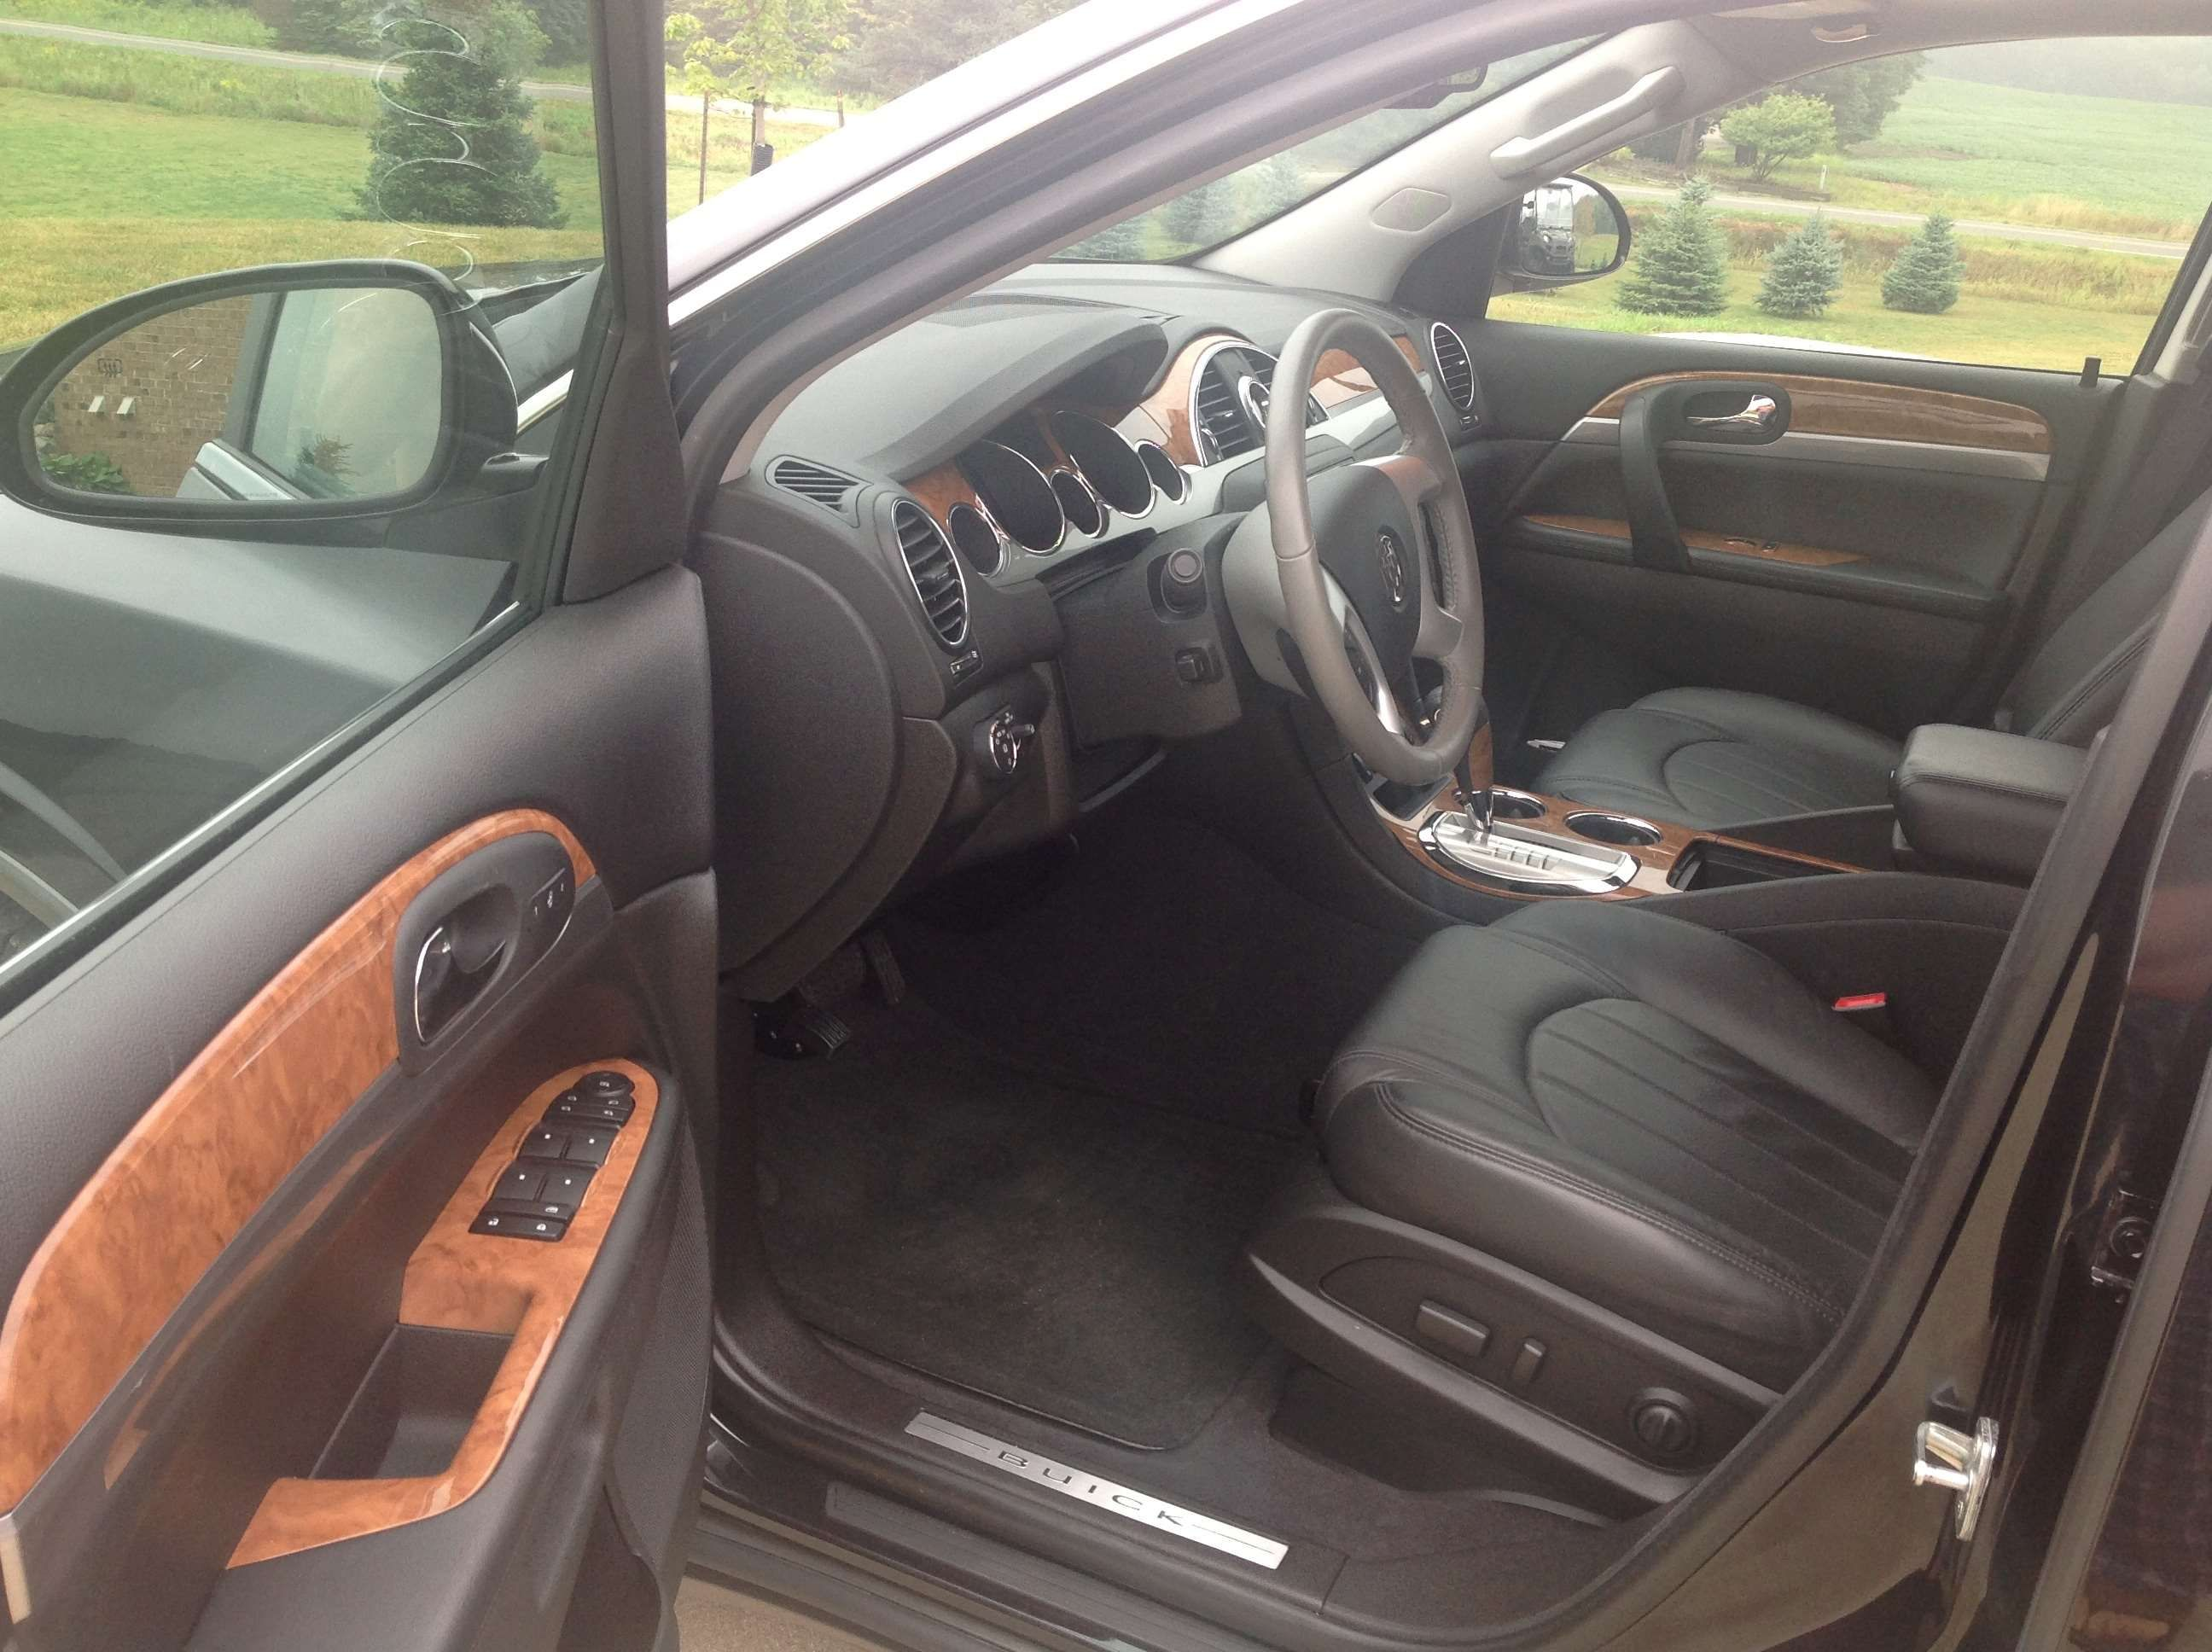 fq shown dr exterior buick suv cars review enclave interior group premium colors oem